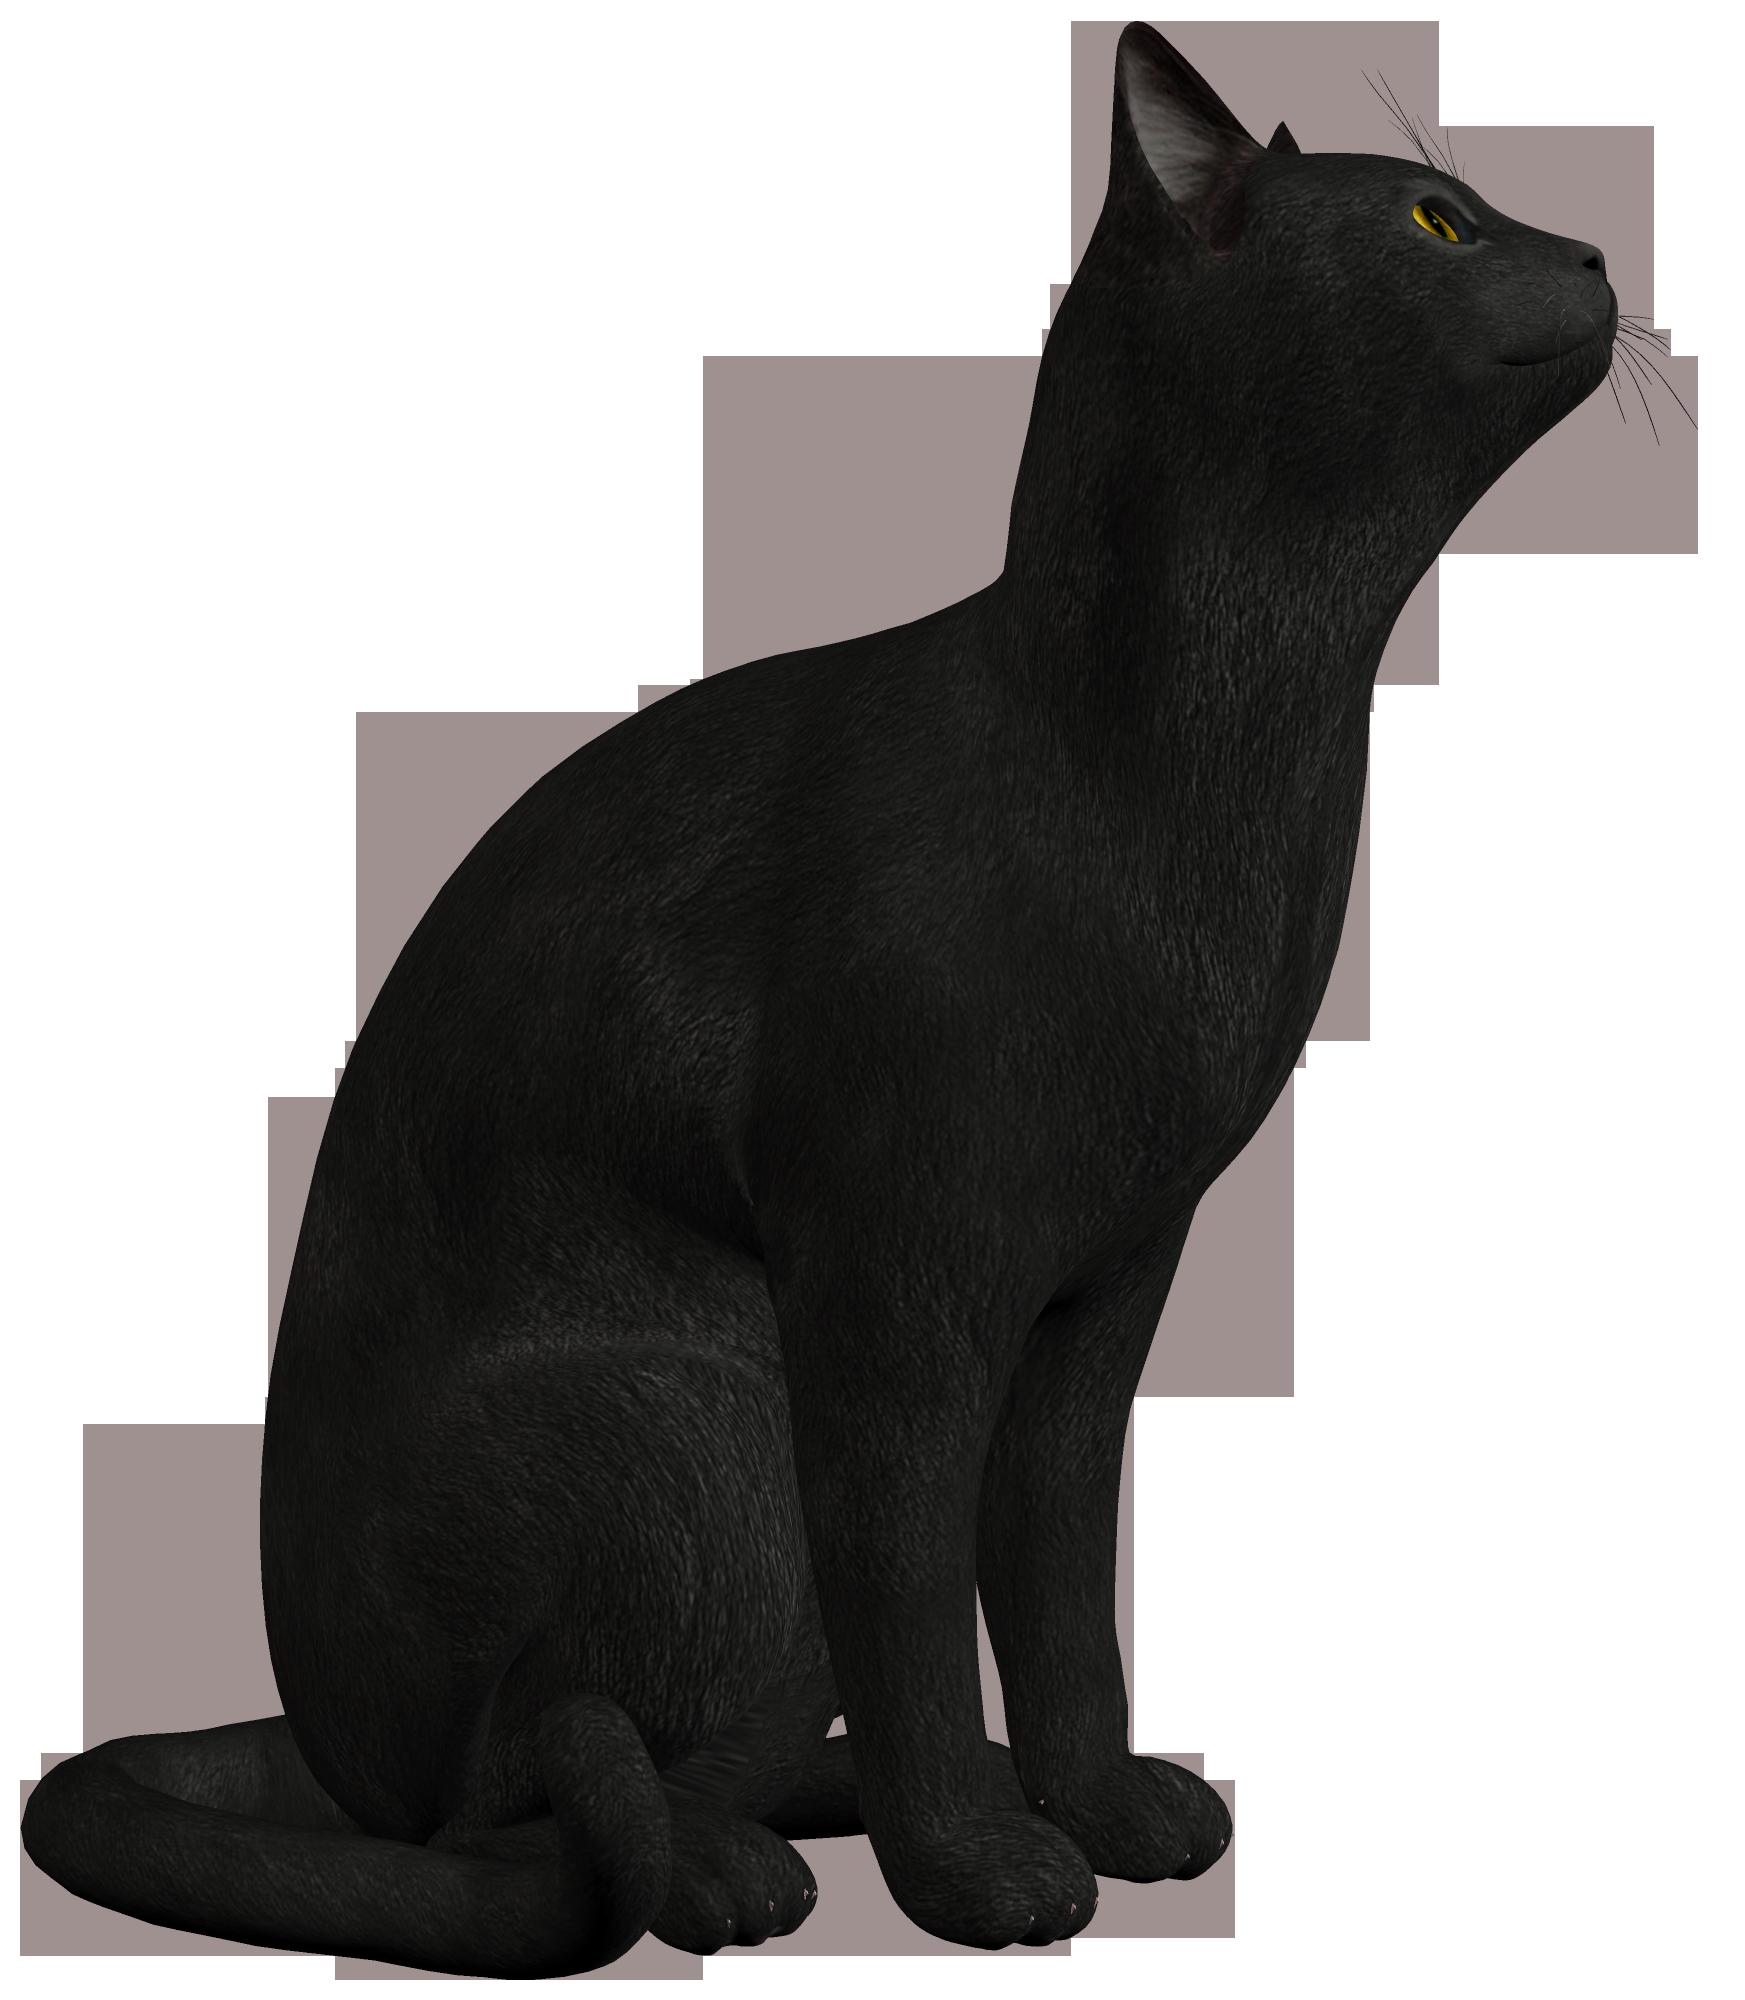 Download Black Cat Photo HQ PNG Image | FreePNGImg